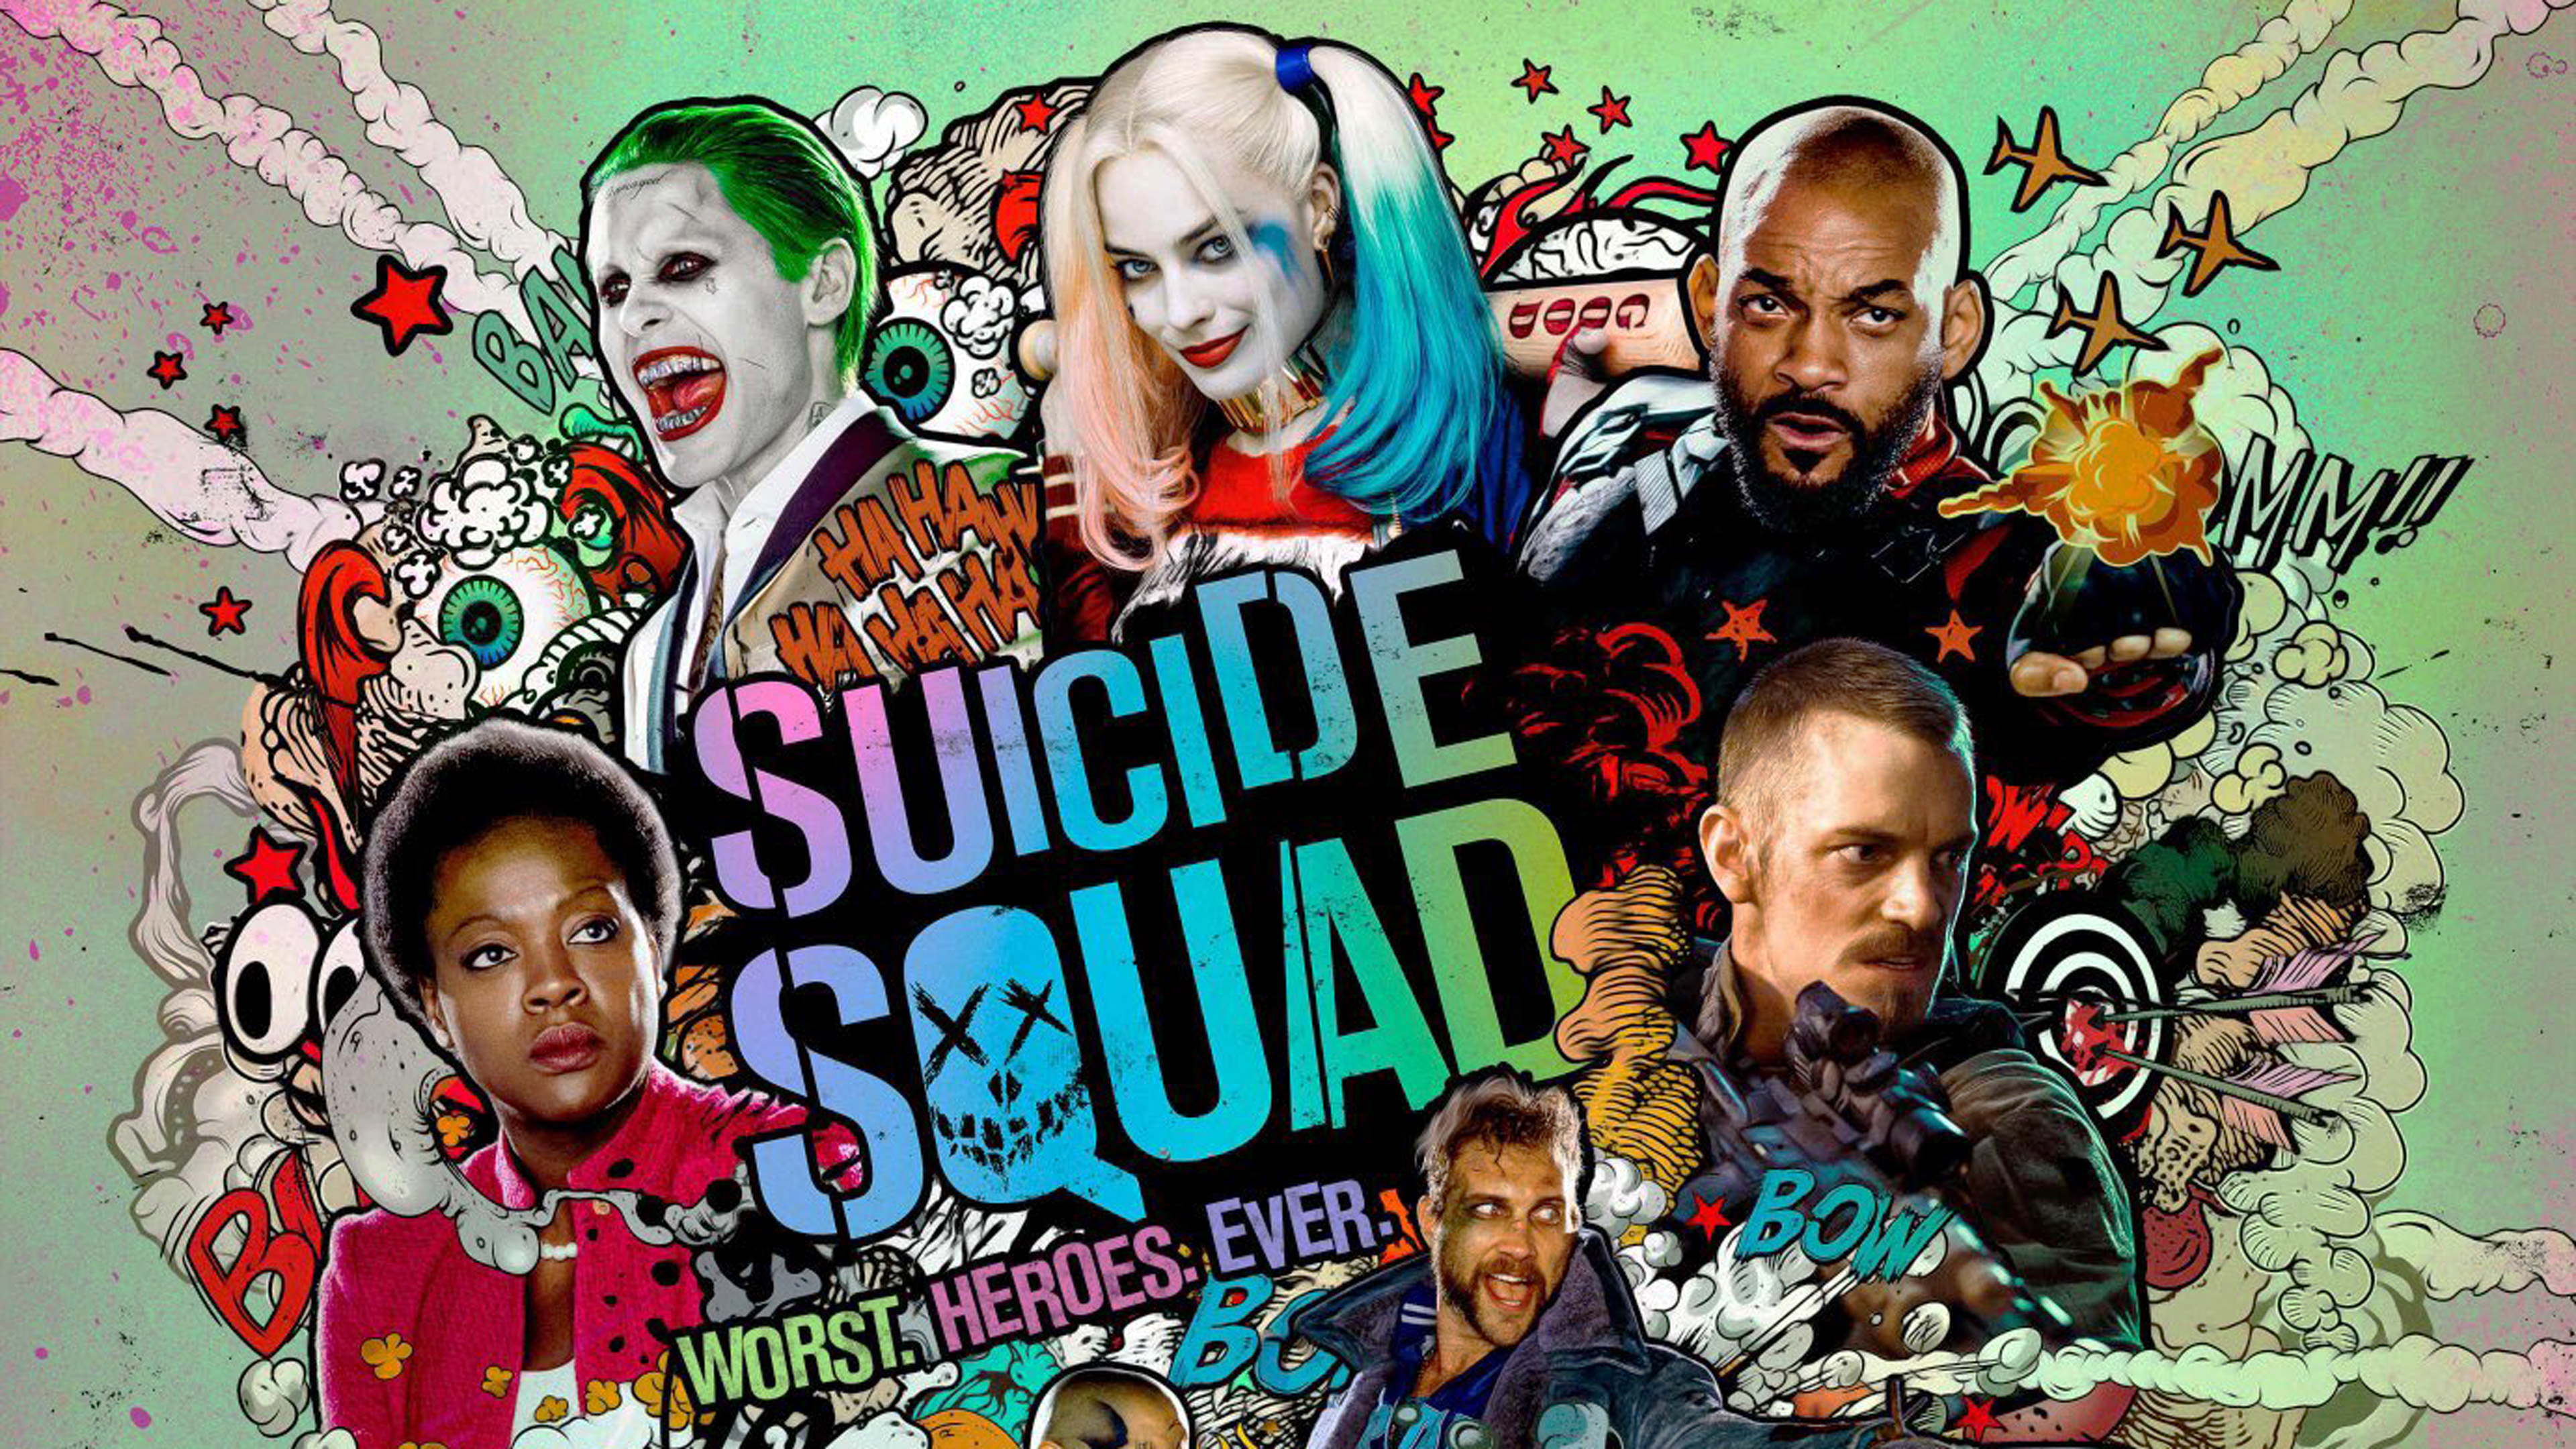 Suicide Squad Wallpaper 5   3840 X 2160 stmednet 3840x2160